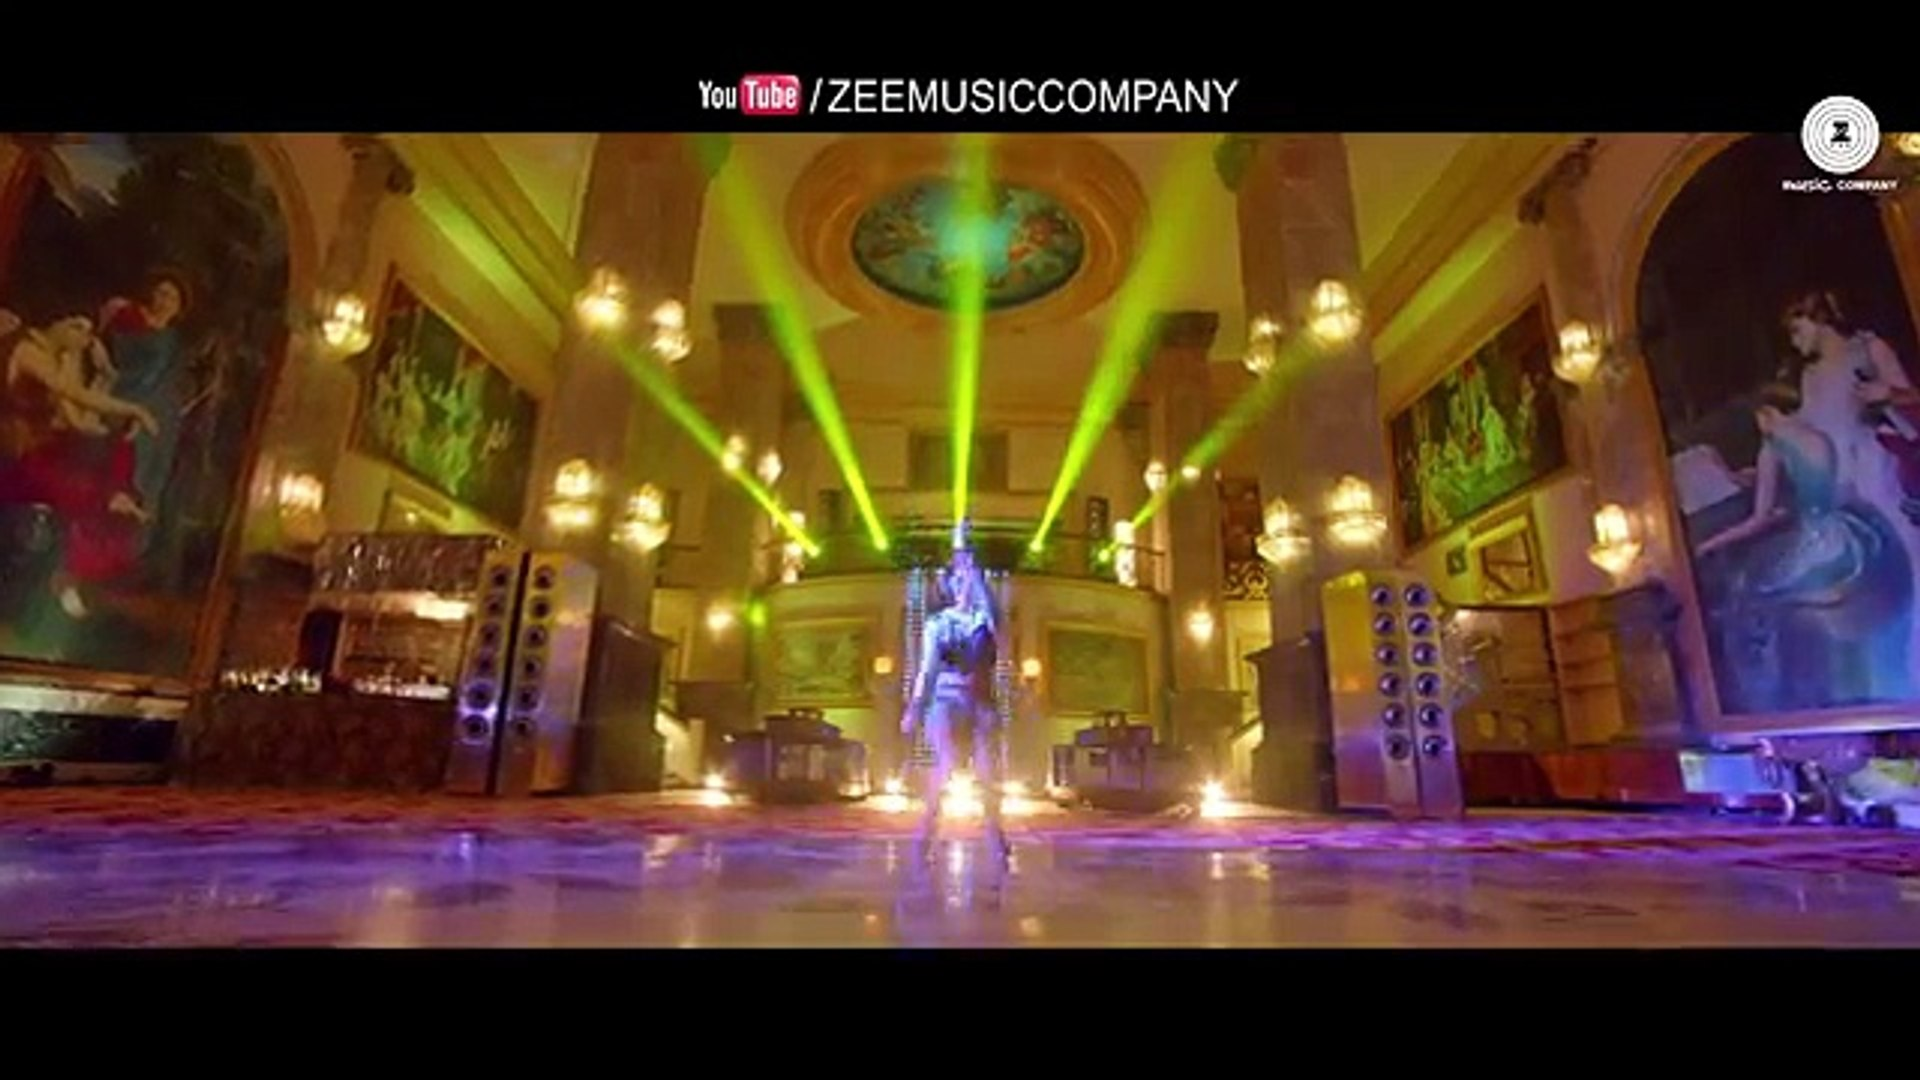 Baby Marvake Maanegi - Raftaar - Nora Fatehi - Remo D'souza - INDIA'S FIRST DANCEHALL SONG